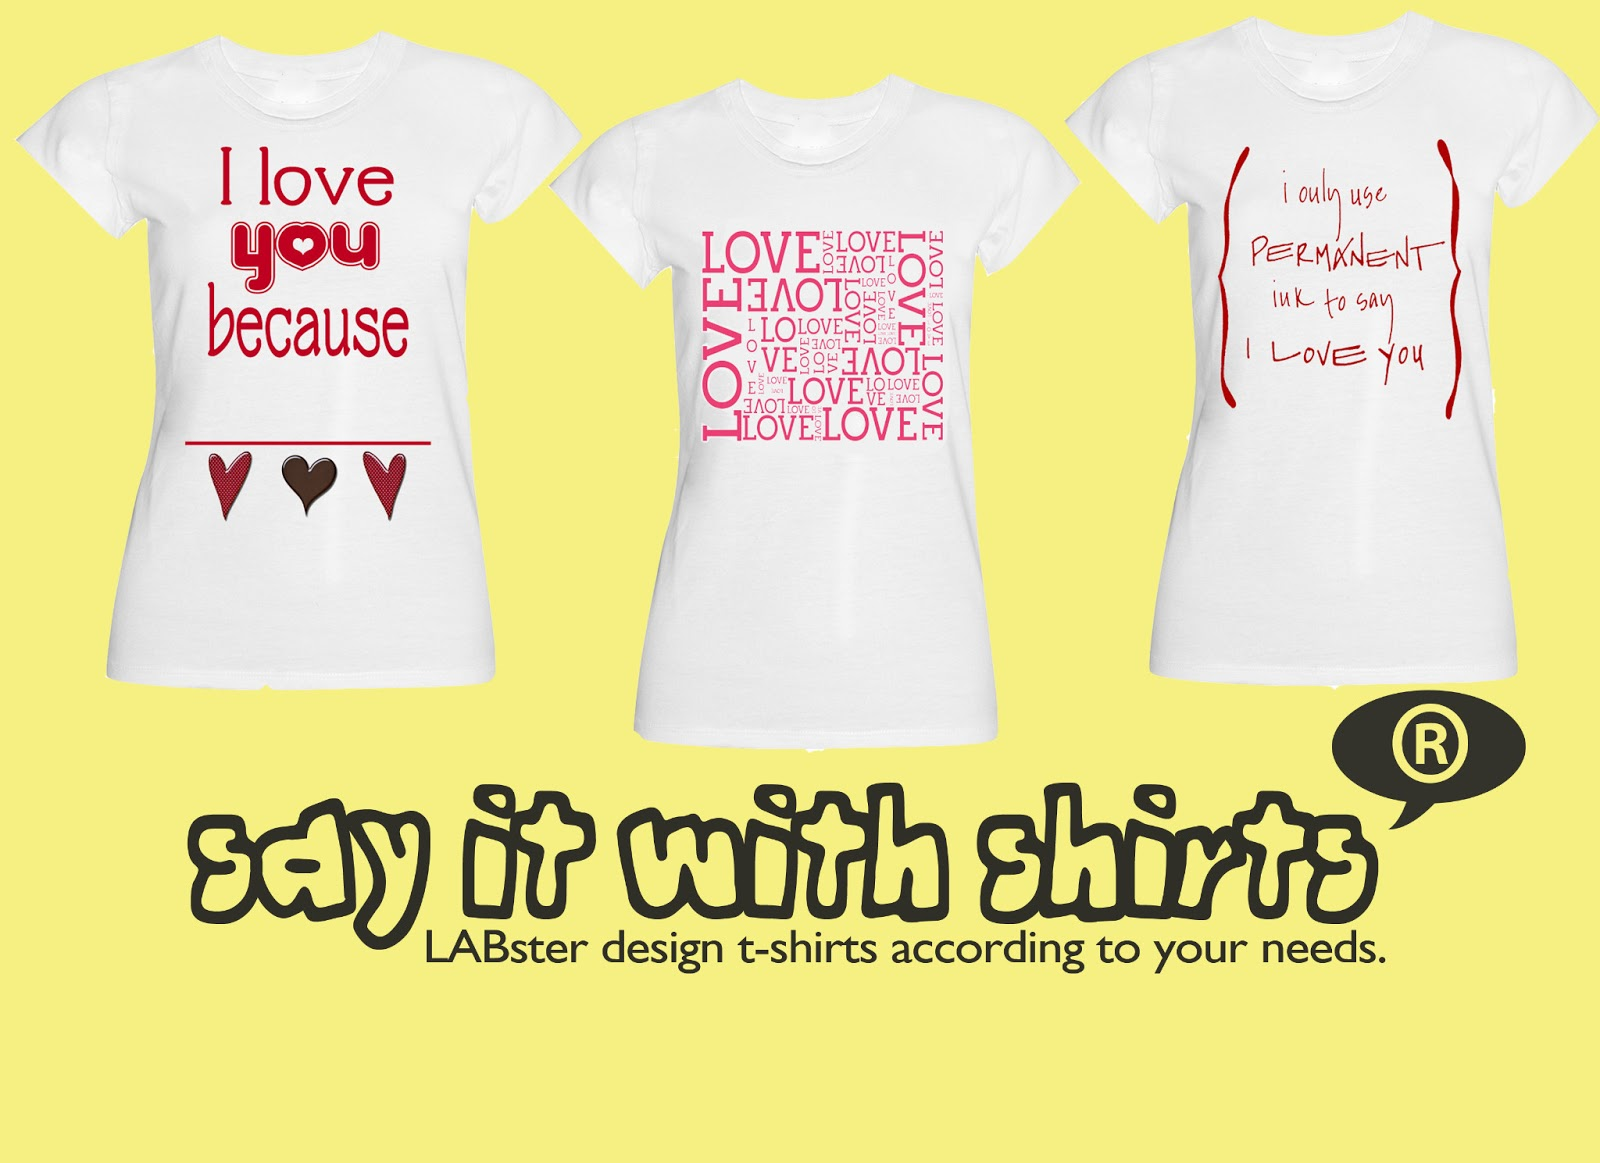 Couple shirt design quotes - Cute Couple Shirt Design Couple Shirt Design Layout